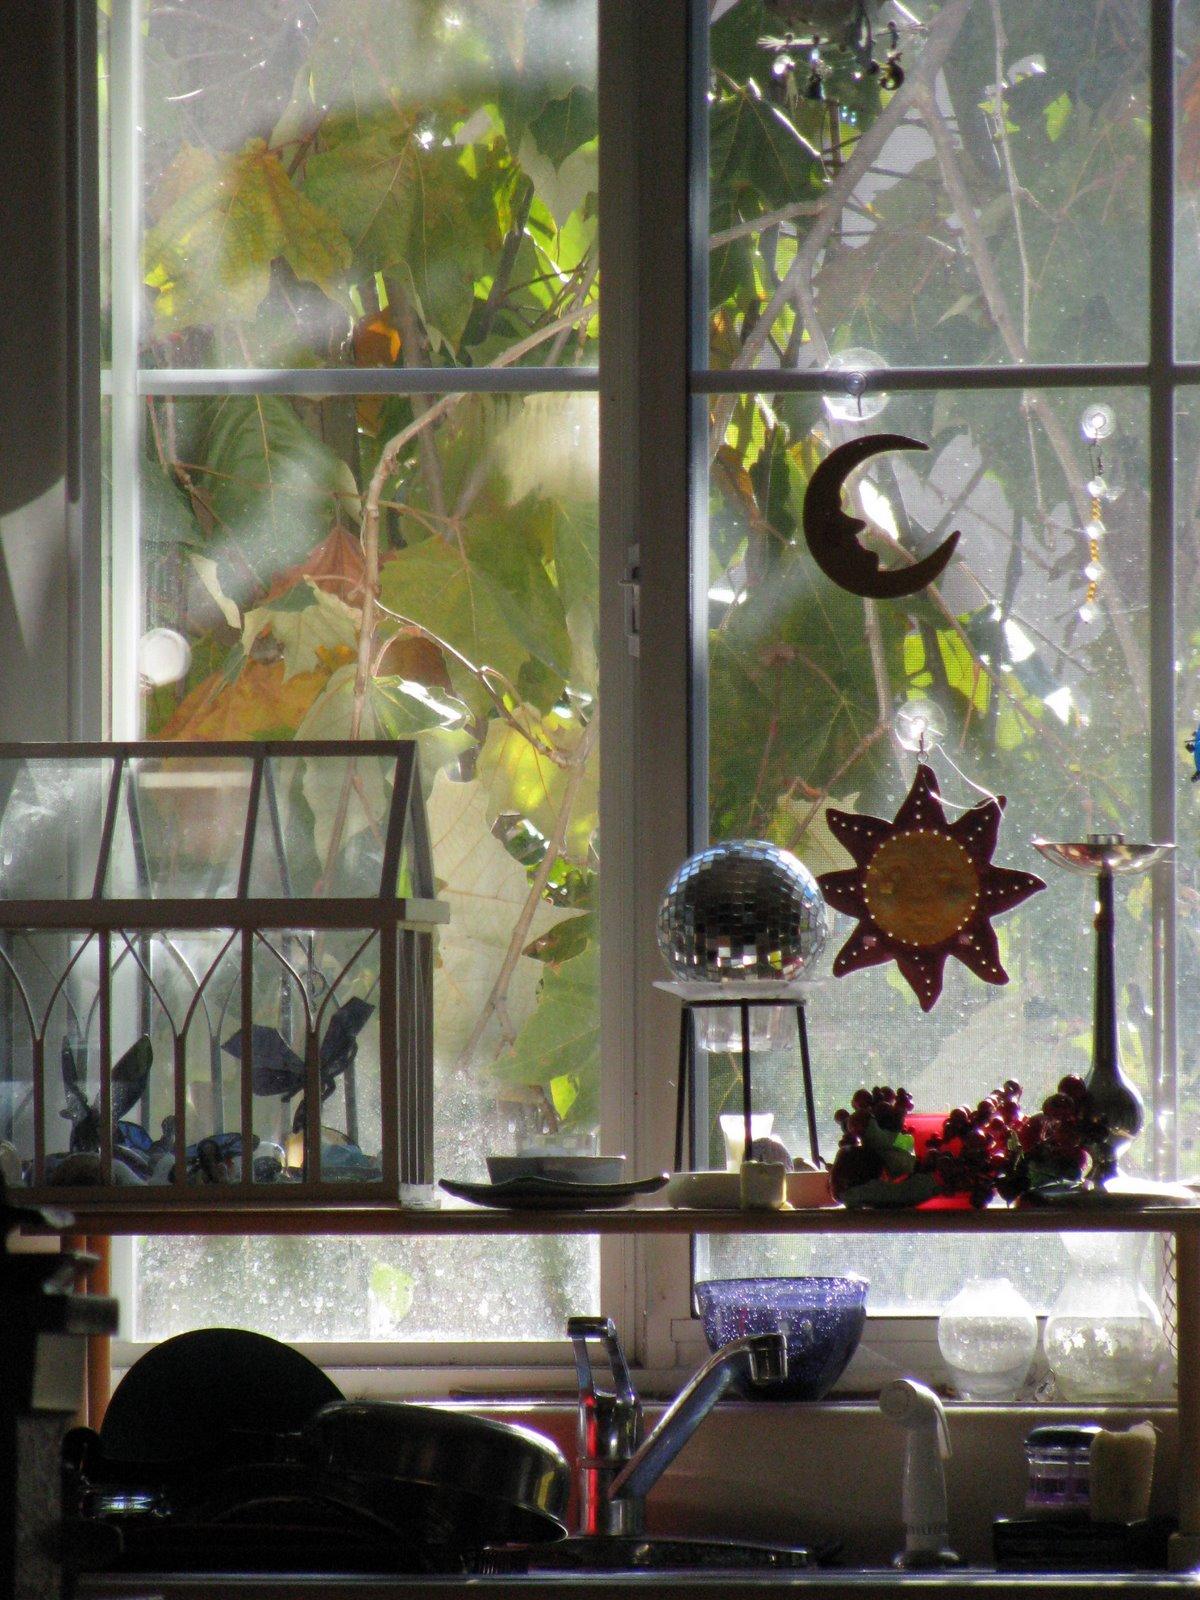 View through Bairbre's kitchen window